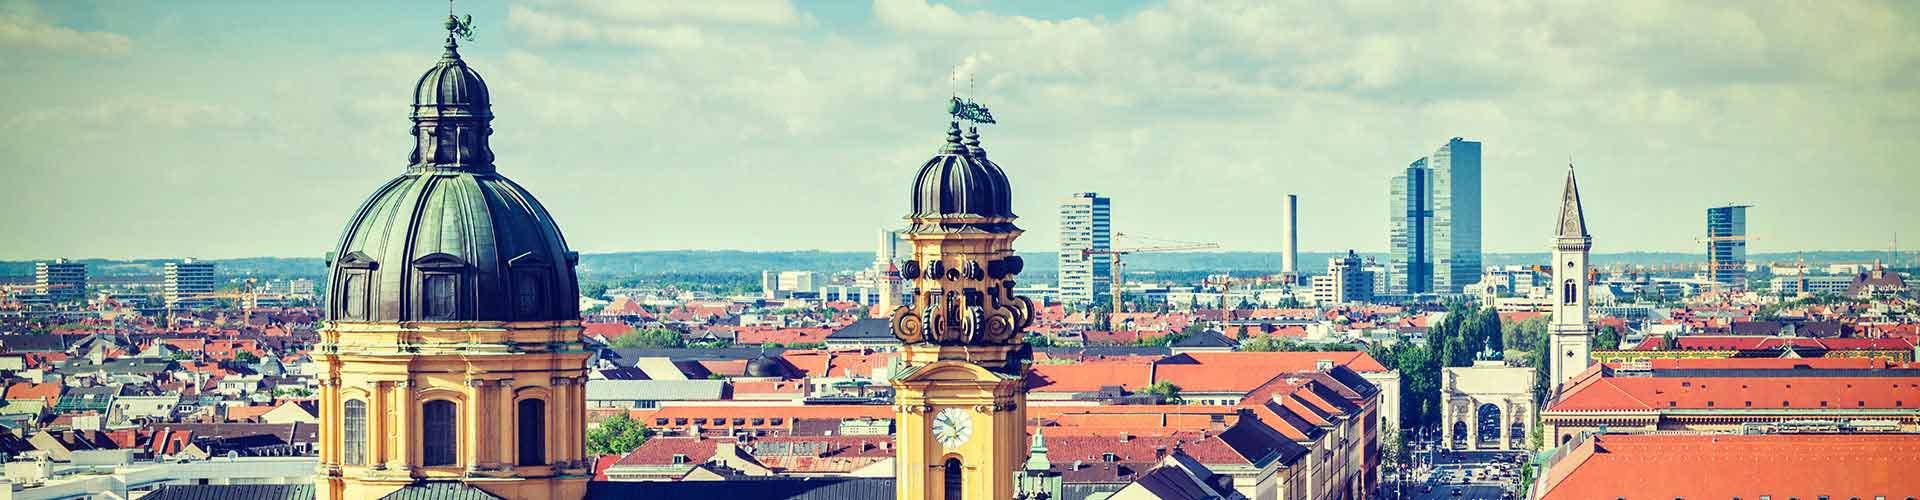 Munich - Hostales en Munich. Mapas de Munich, Fotos y comentarios de cada Hostal en Munich.